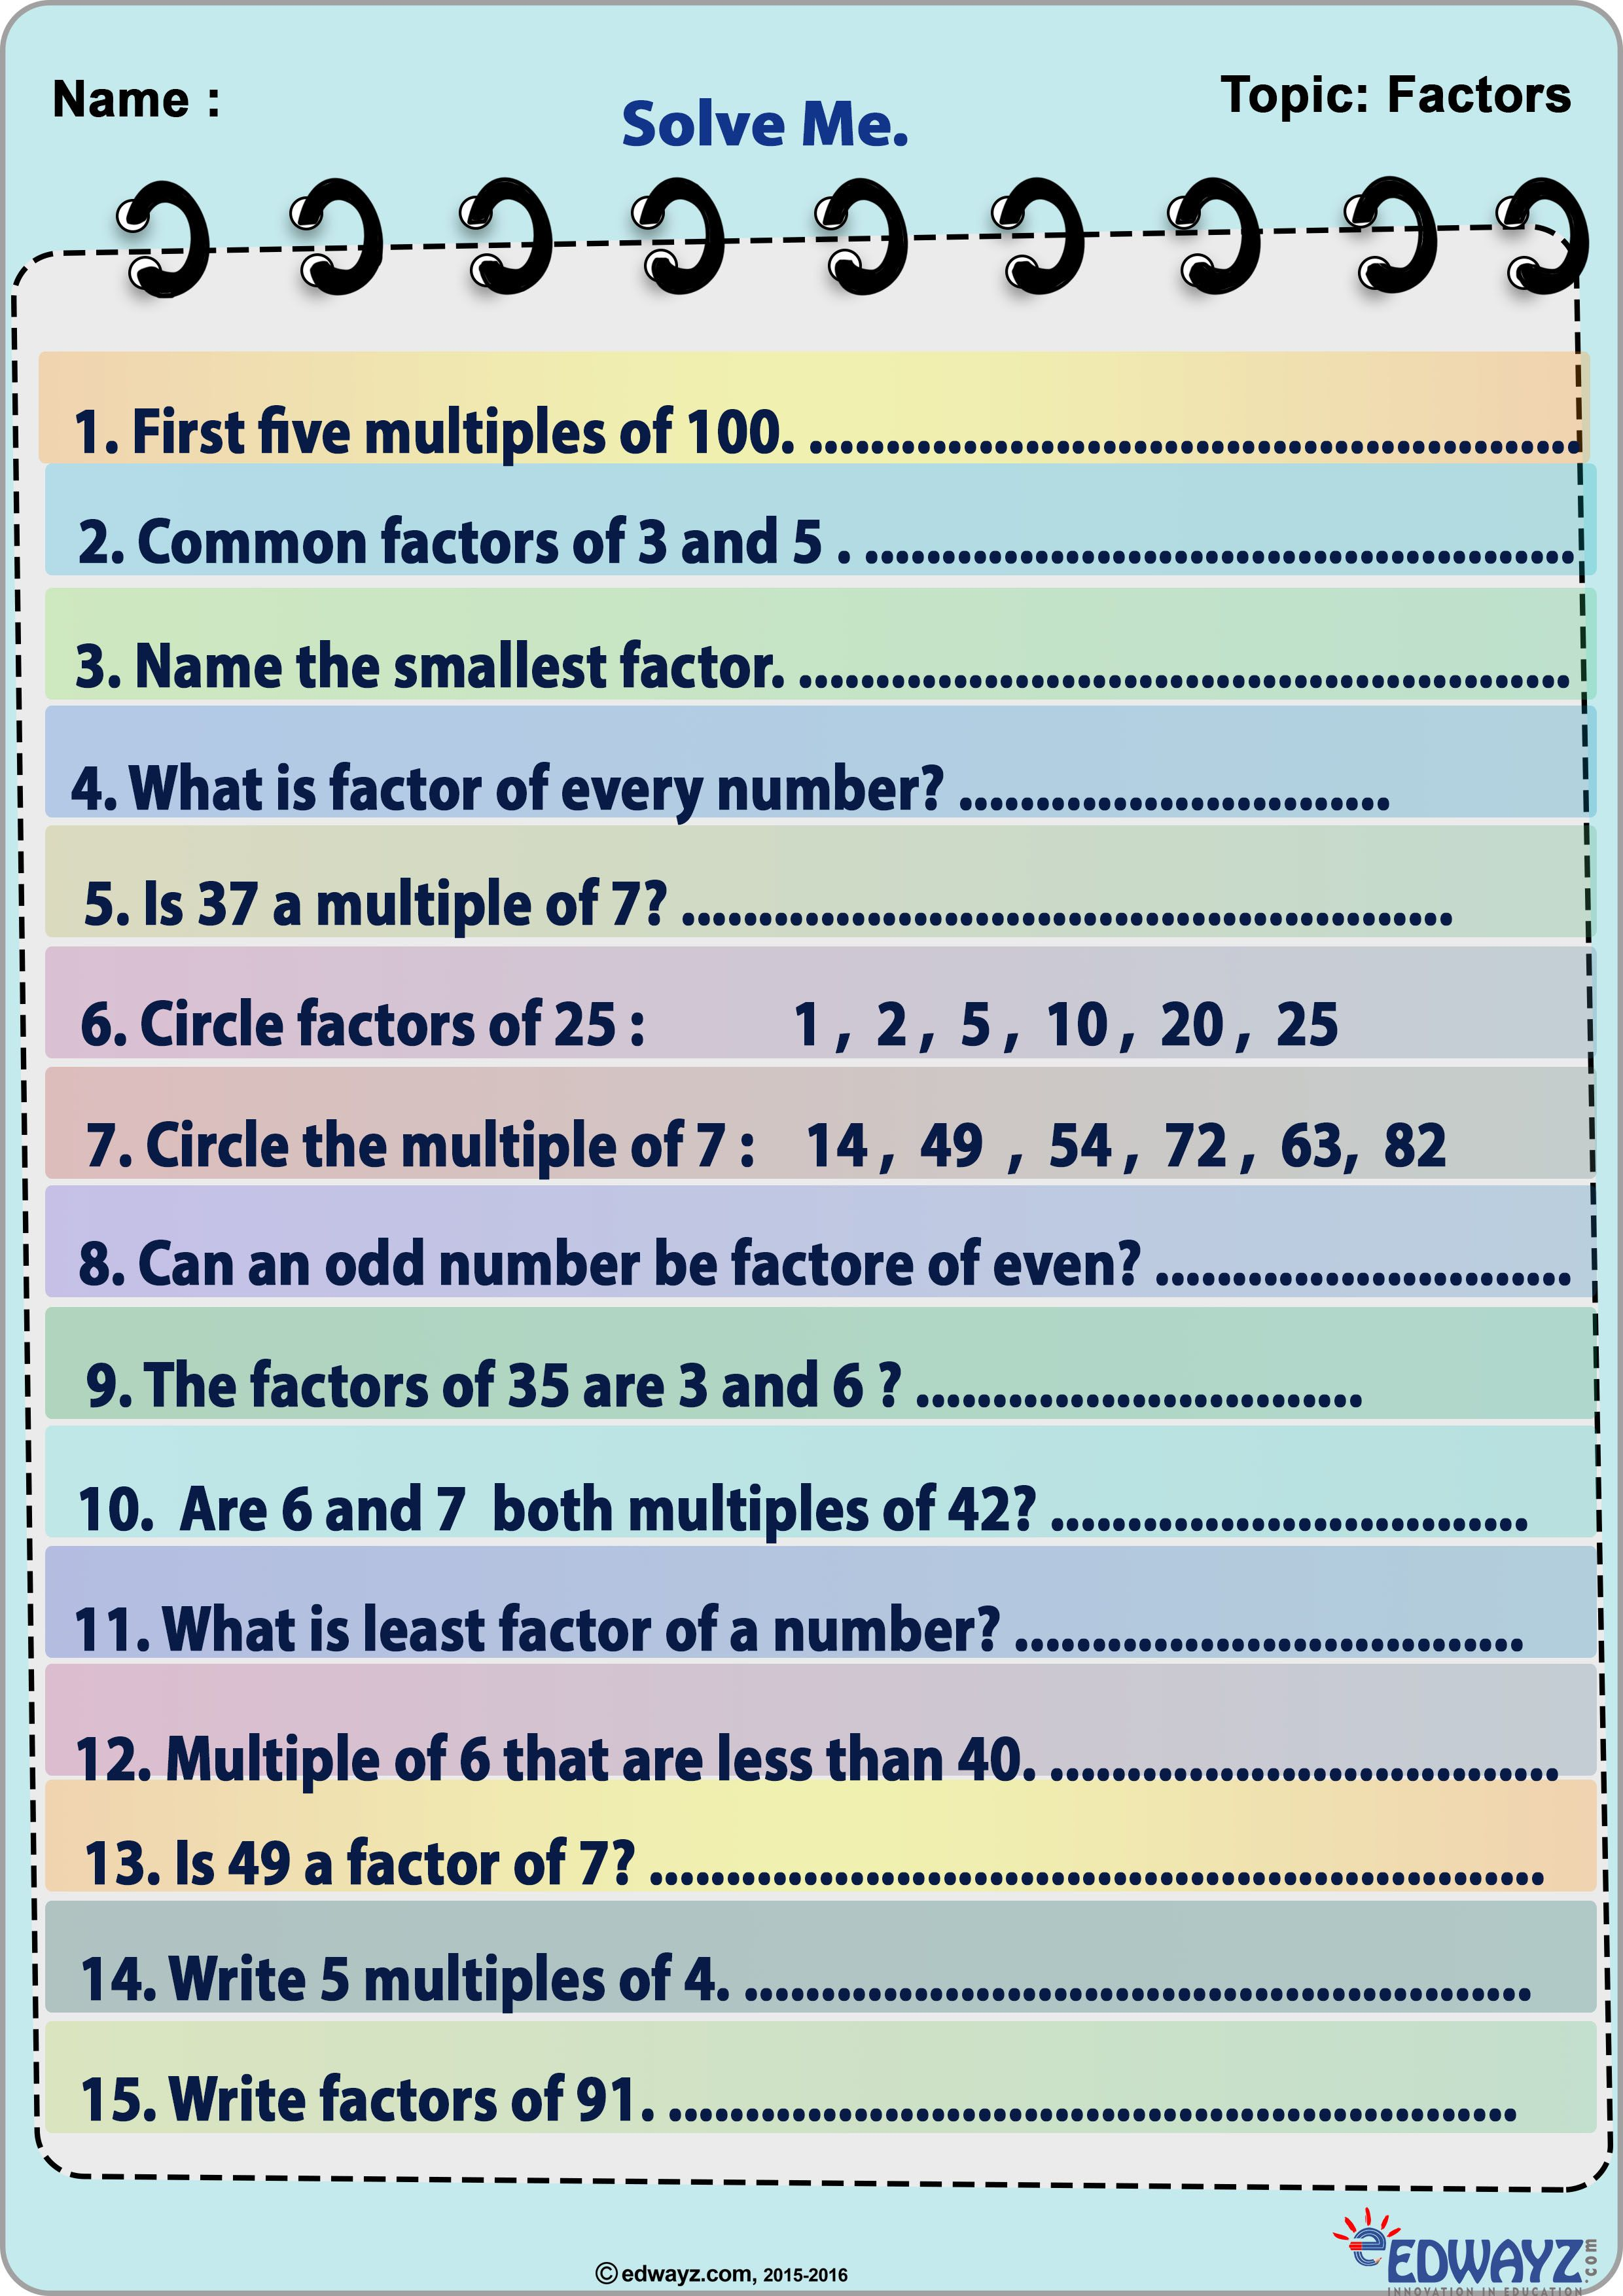 worksheets #math #factors #kids #funlearning #edwayz   Mental maths  worksheets [ 3508 x 2480 Pixel ]